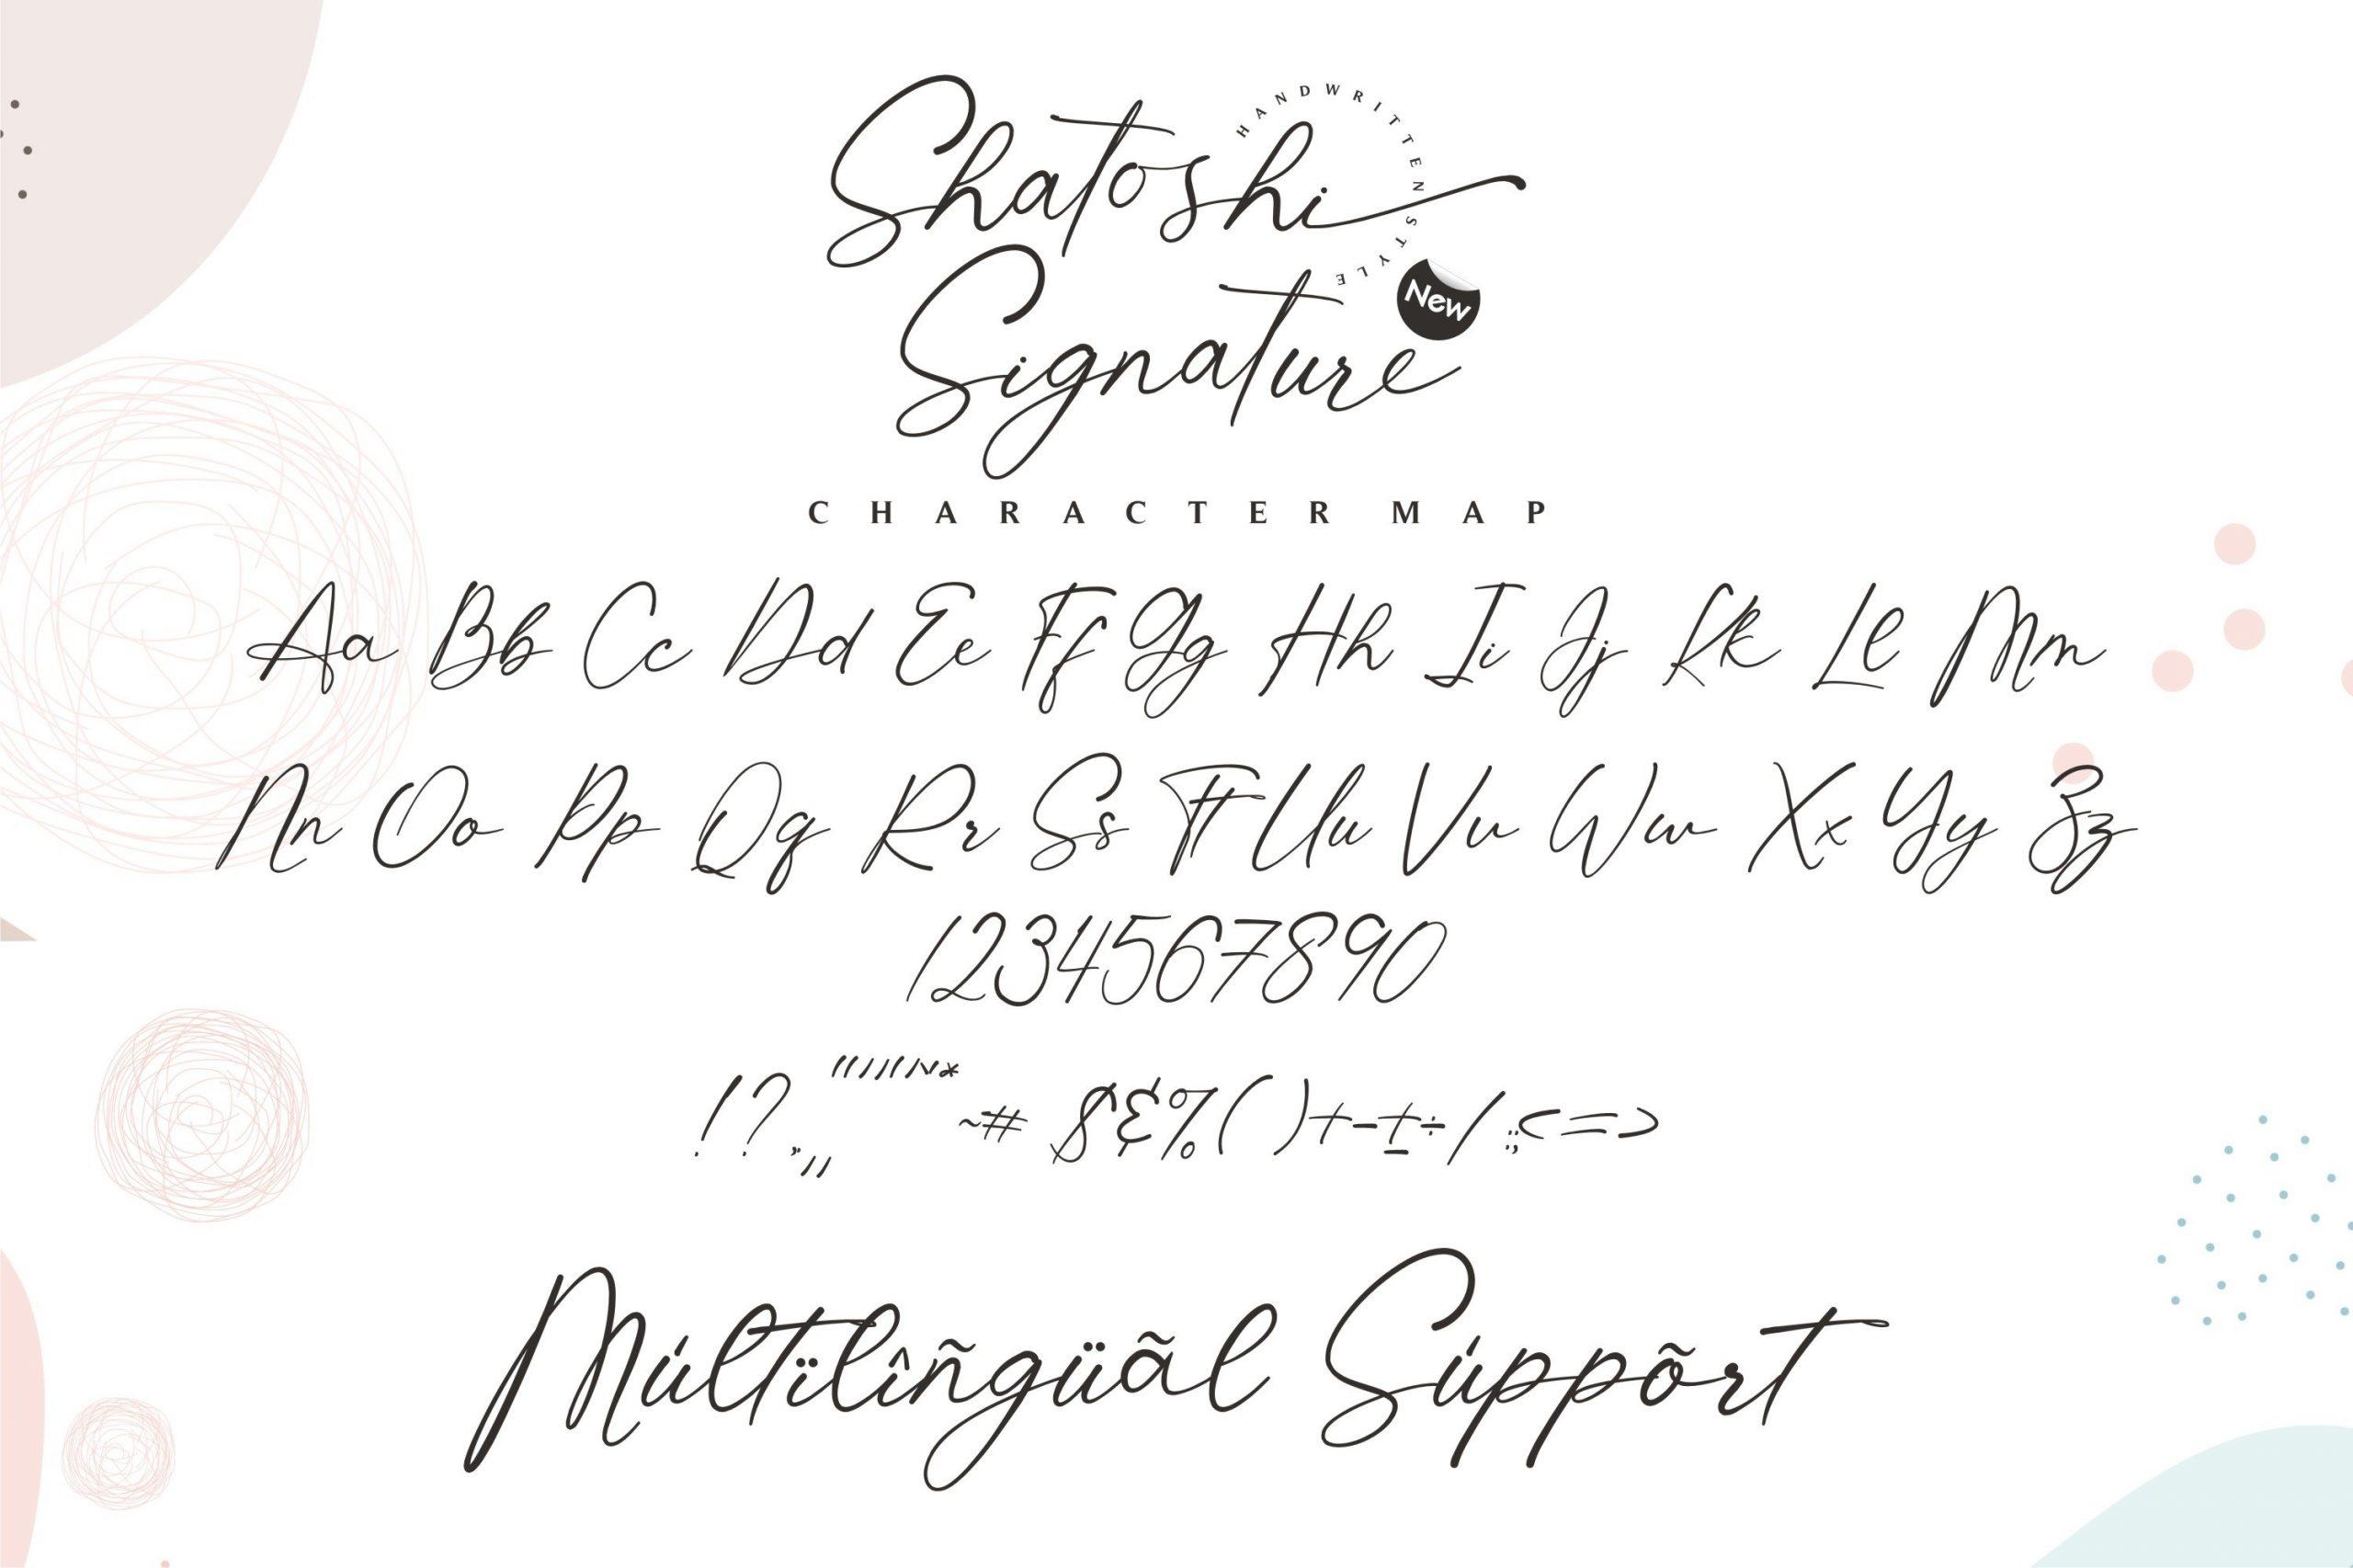 Shatoshi Signature Modern Signature Font-3